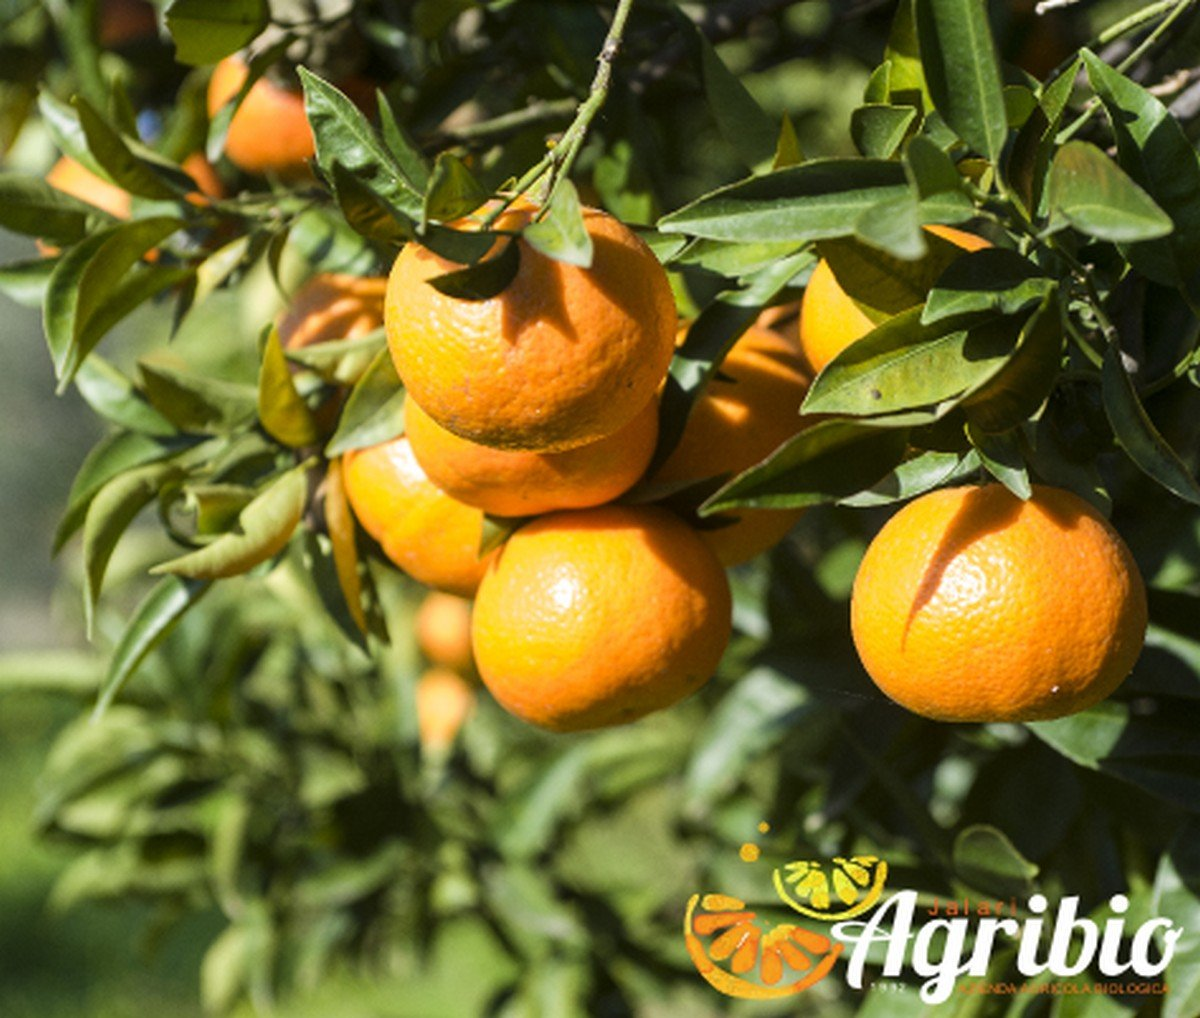 Mandarini Marzolini Azienda Agricola Biologica Jalari